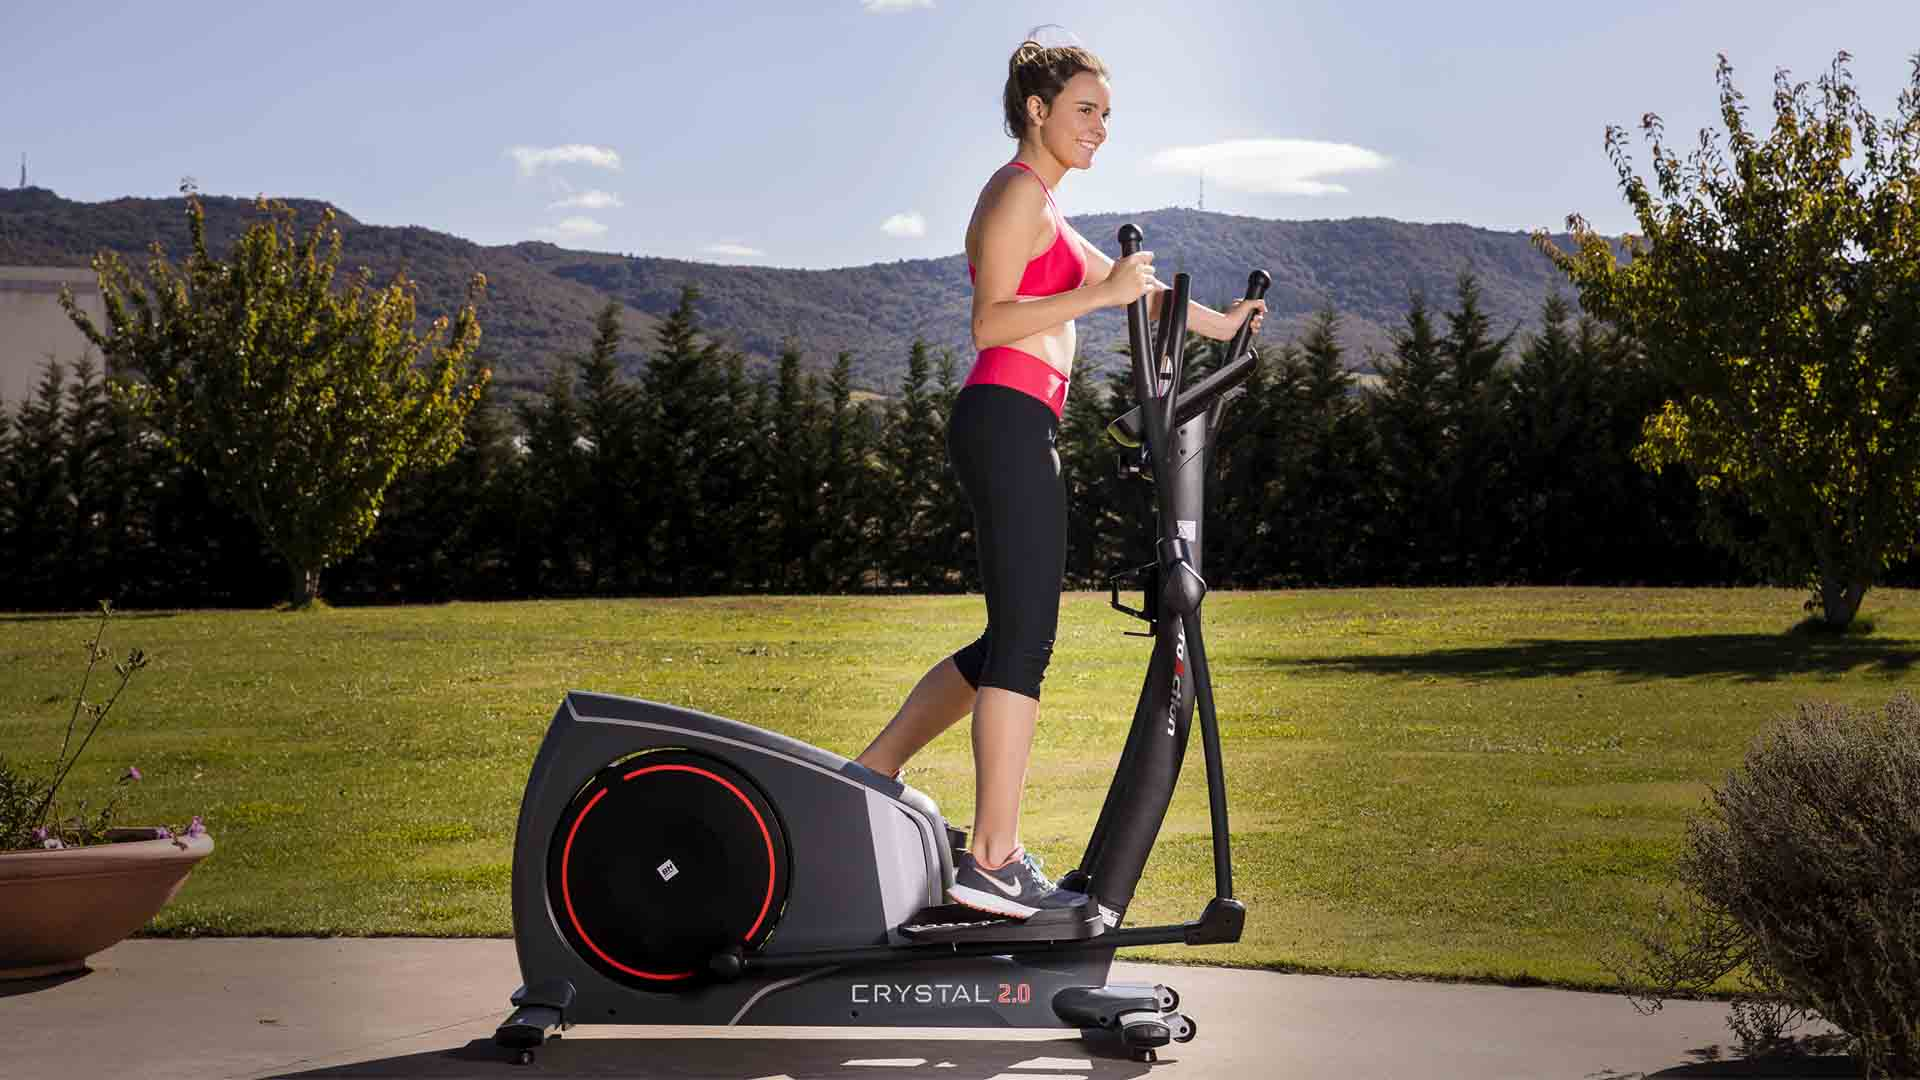 BH Fitness i.CRYSTAL 2.0